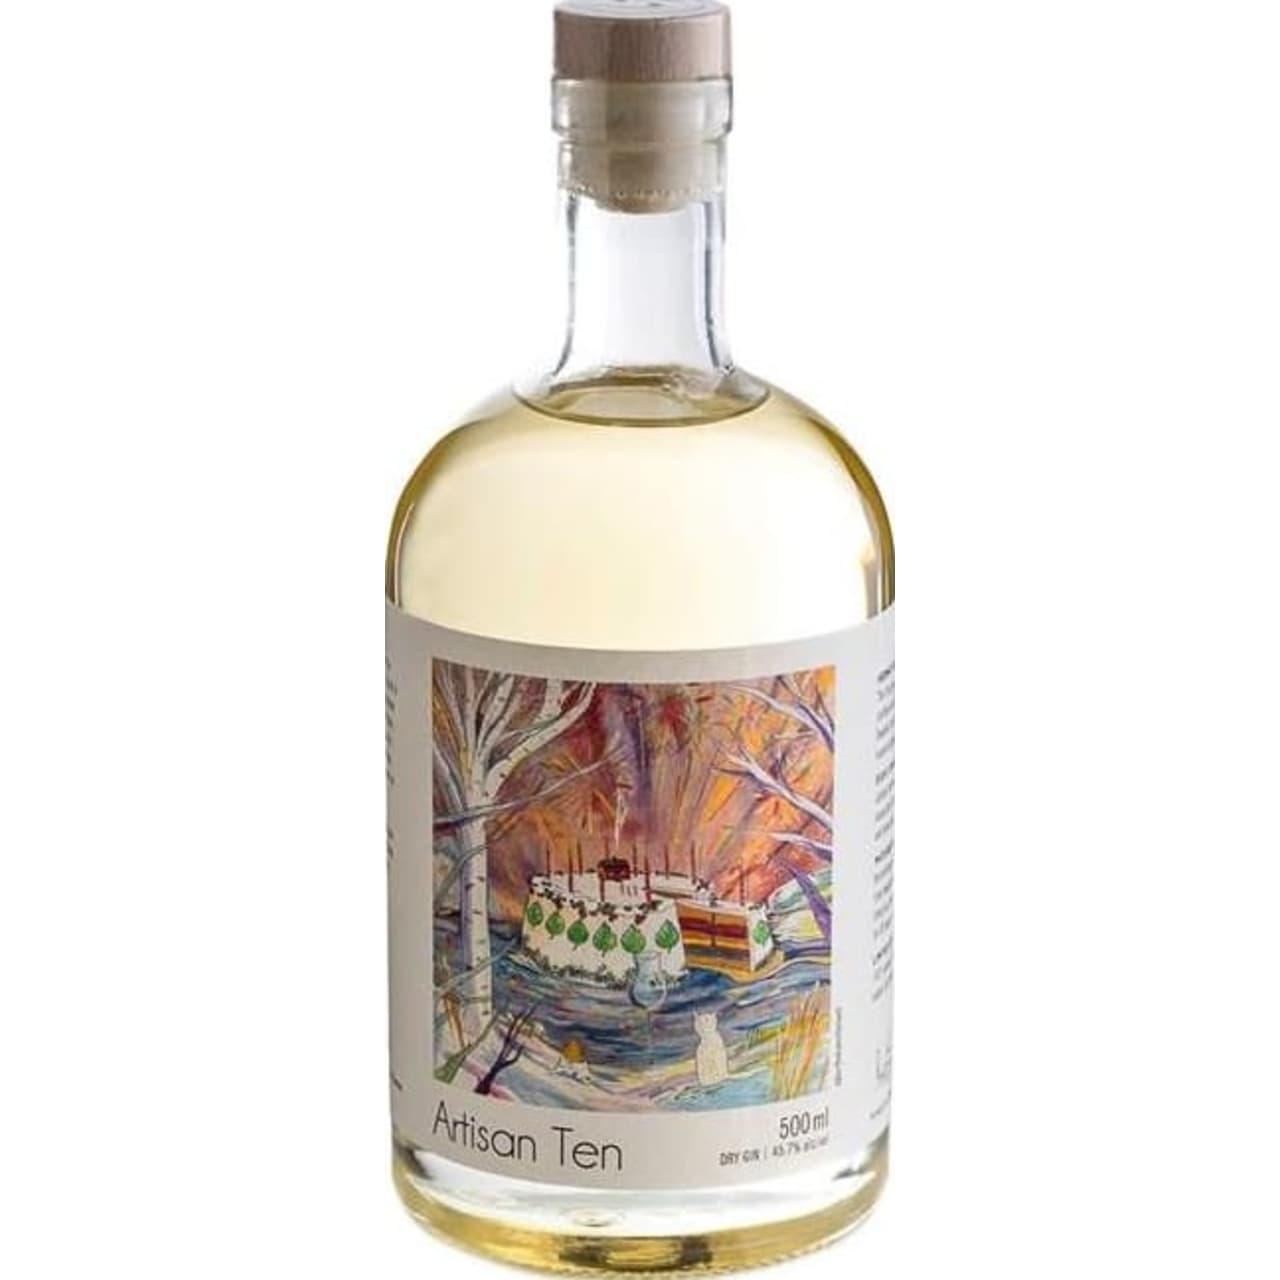 Product Image - Hernö Artisan Ten Organic Gin